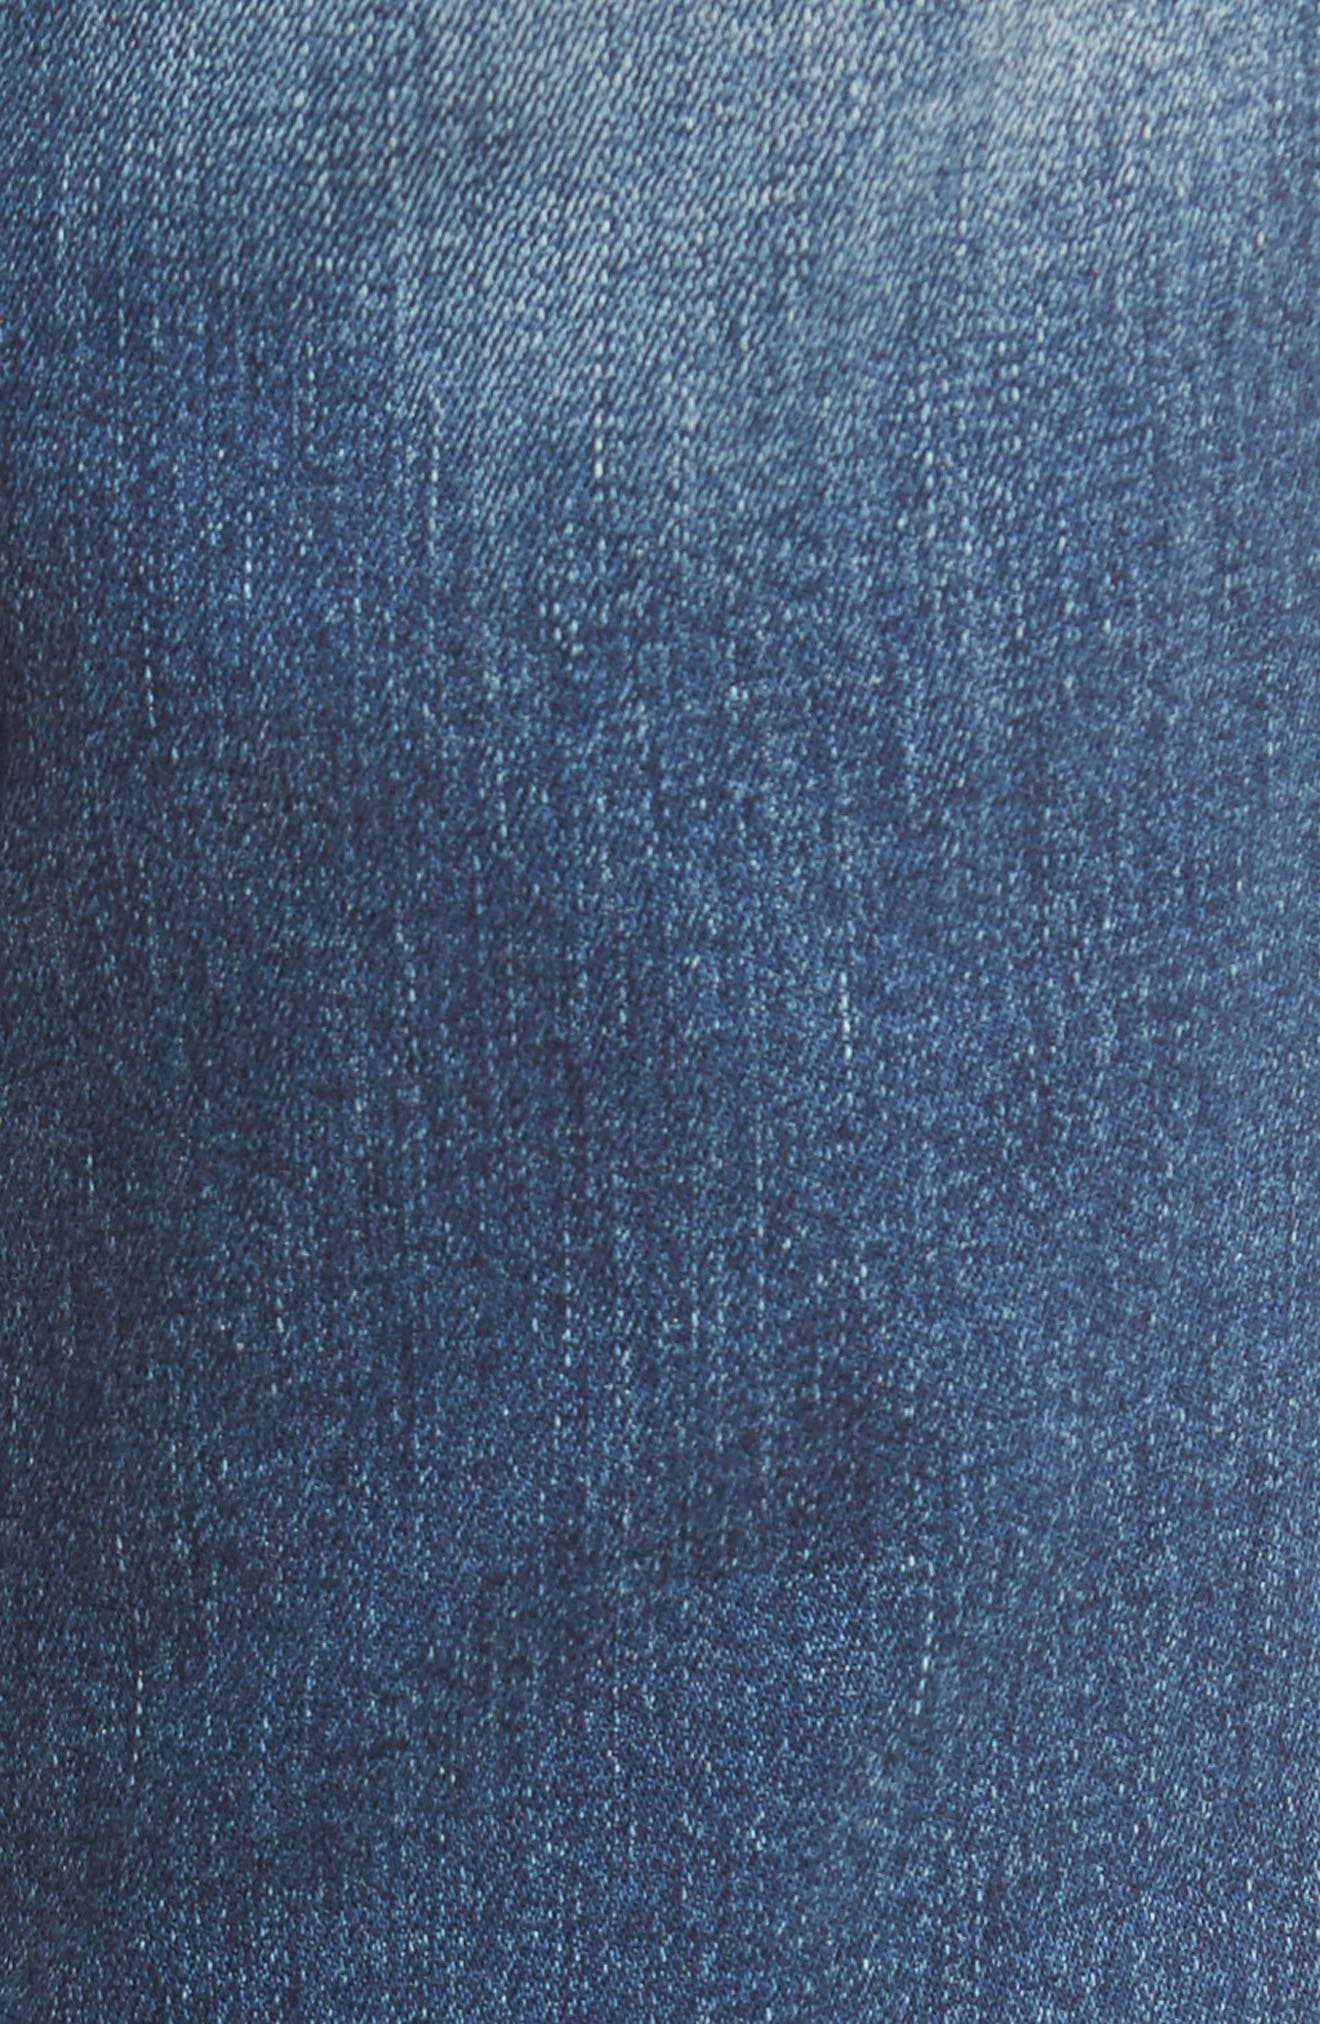 Distressed Fray Hem Skinny Jeans,                             Alternate thumbnail 6, color,                             420